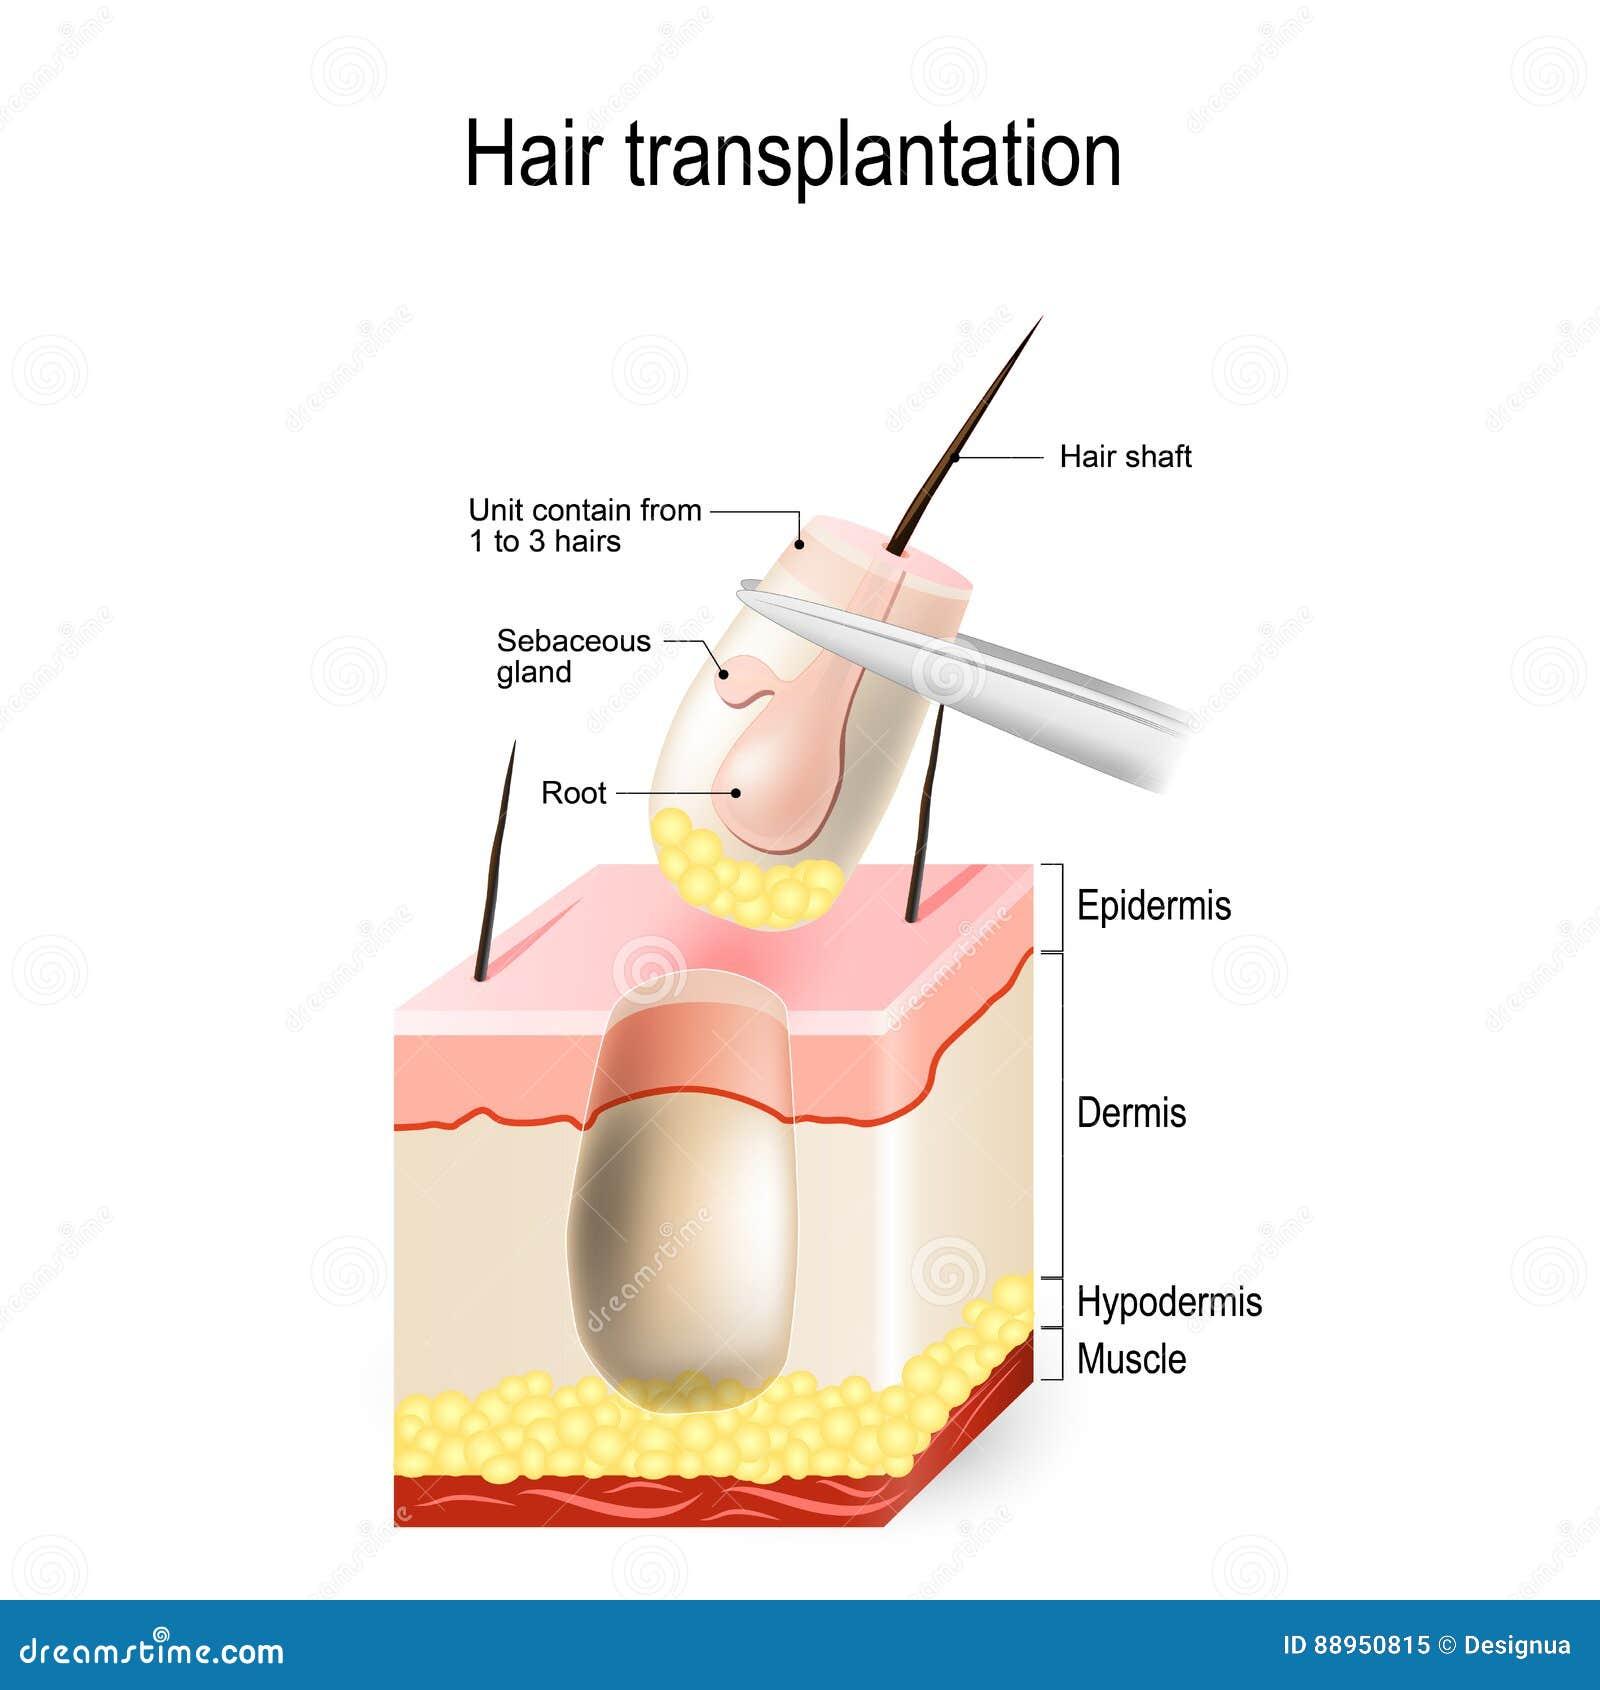 transplantation cartoons illustrations vector stock. Black Bedroom Furniture Sets. Home Design Ideas